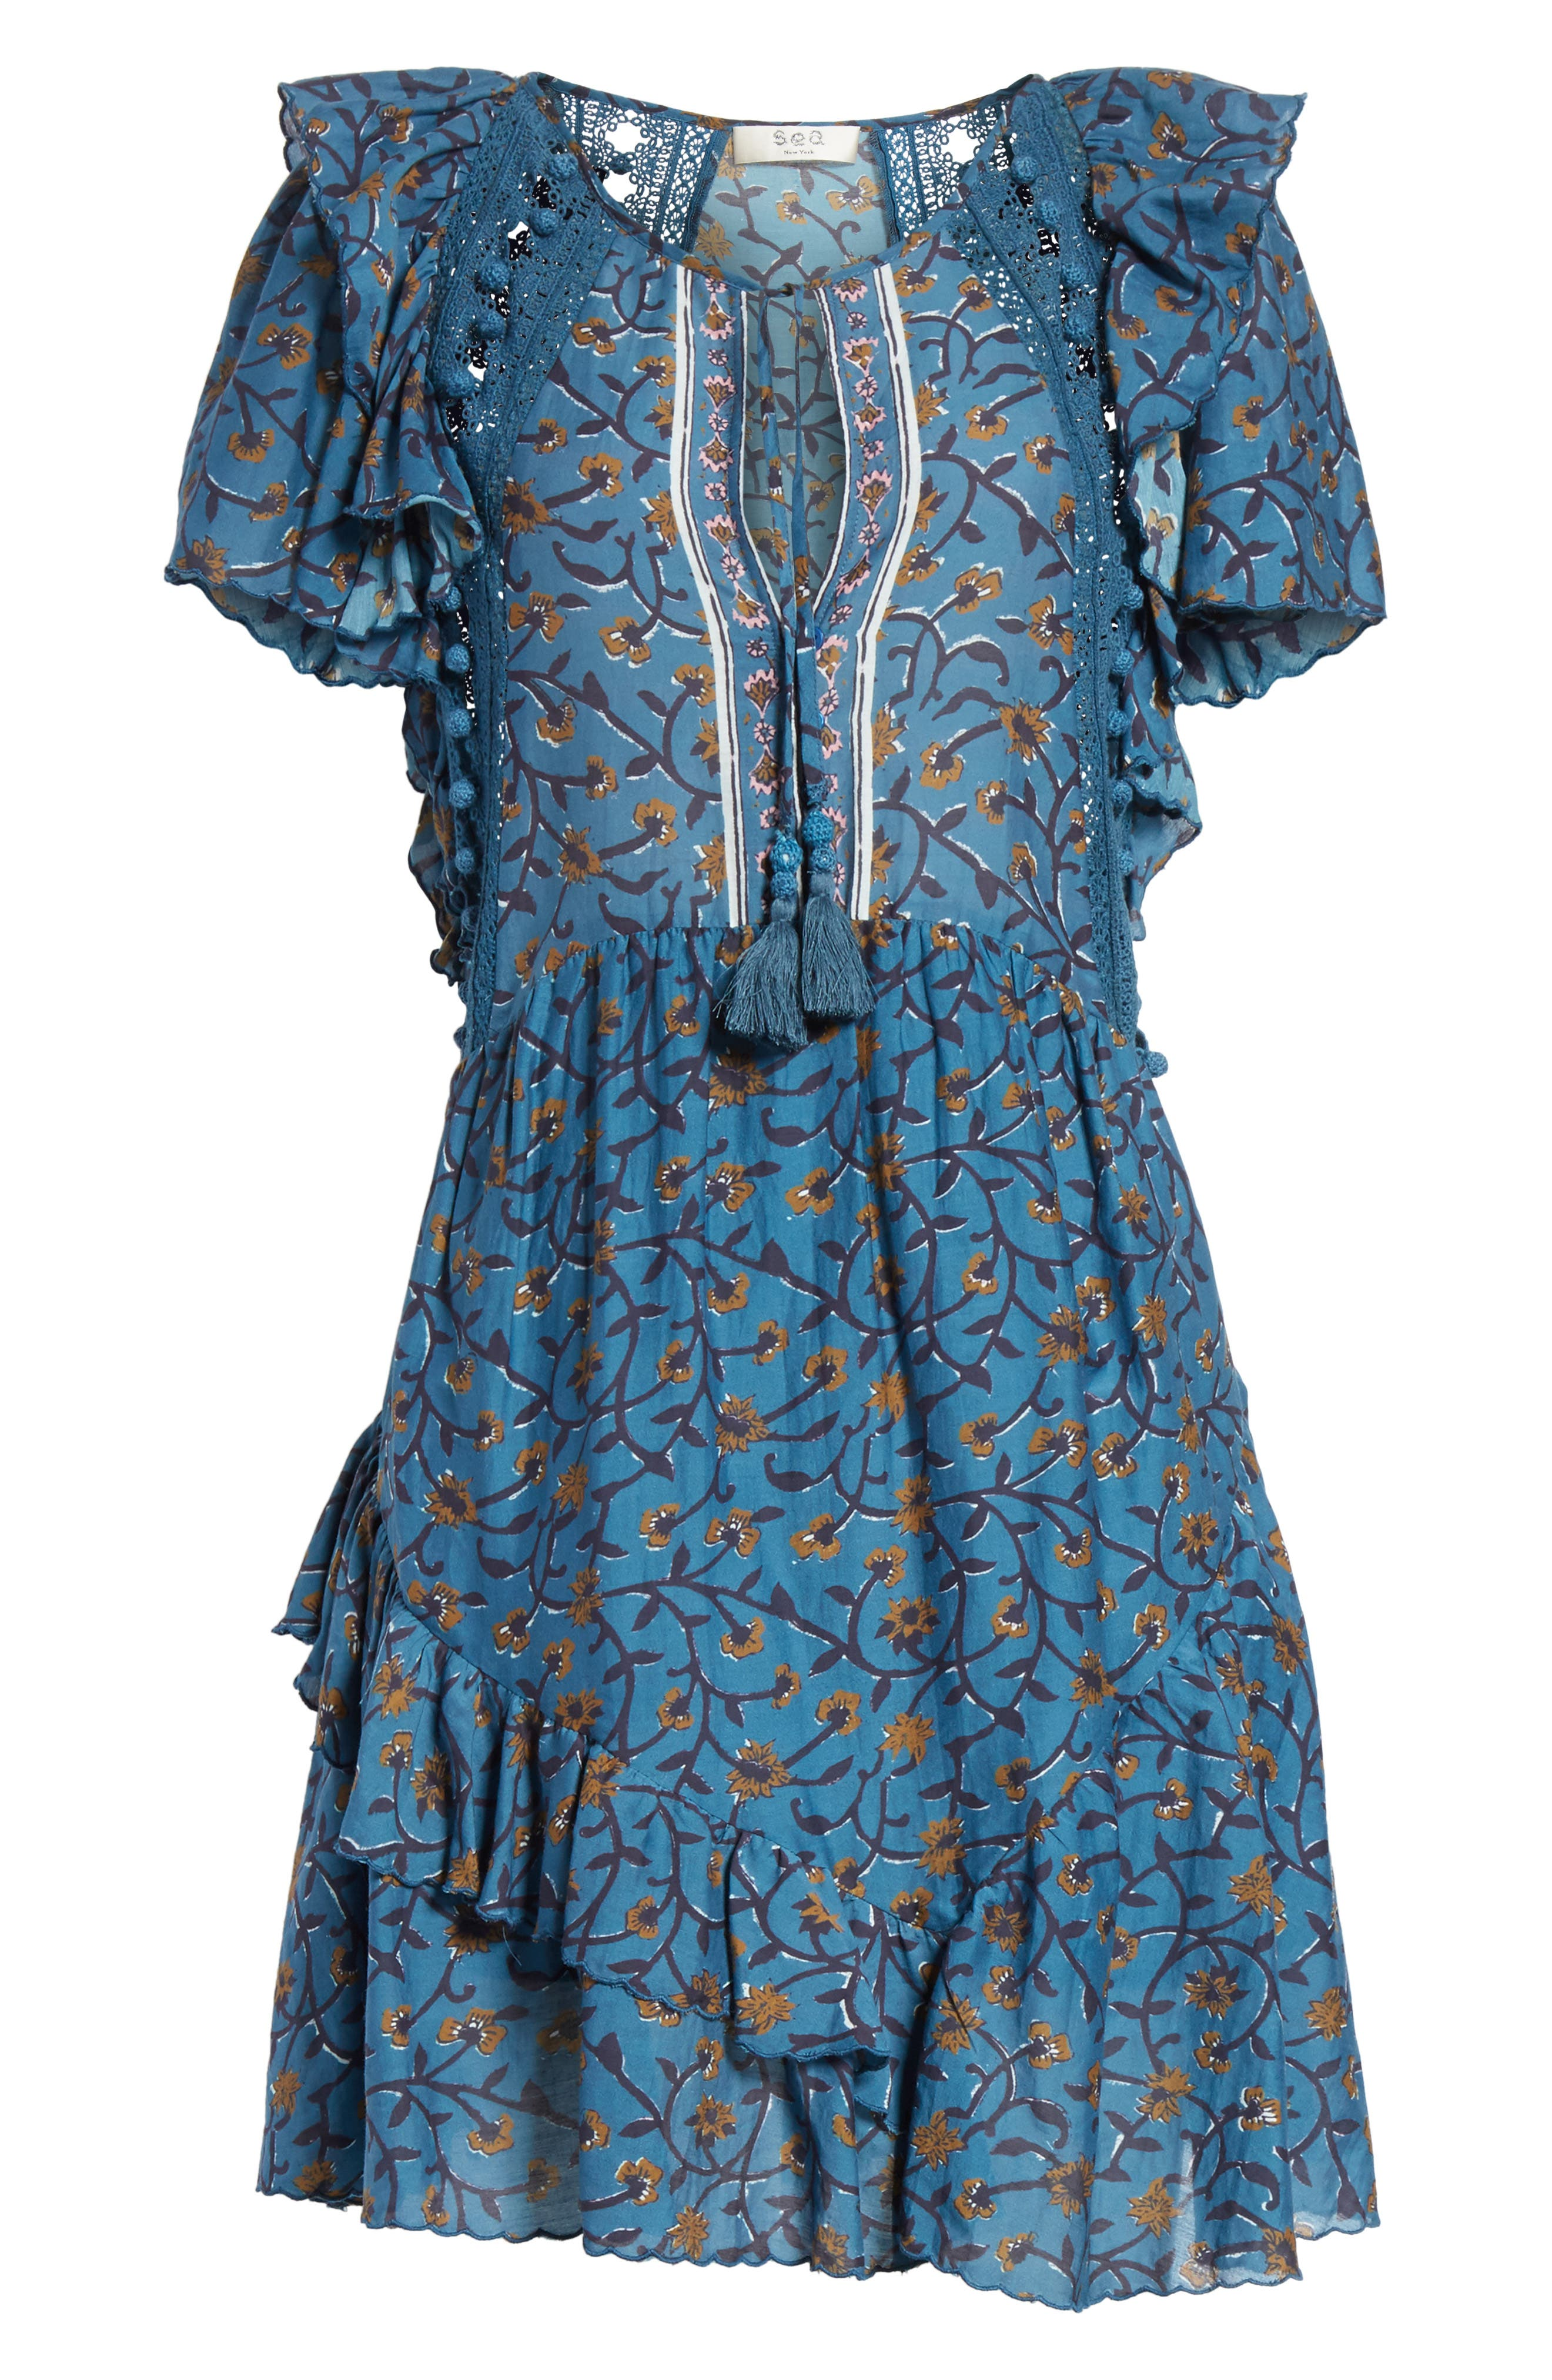 Kaylee Crochet Pompom Dress,                             Alternate thumbnail 6, color,                             Steel Blue